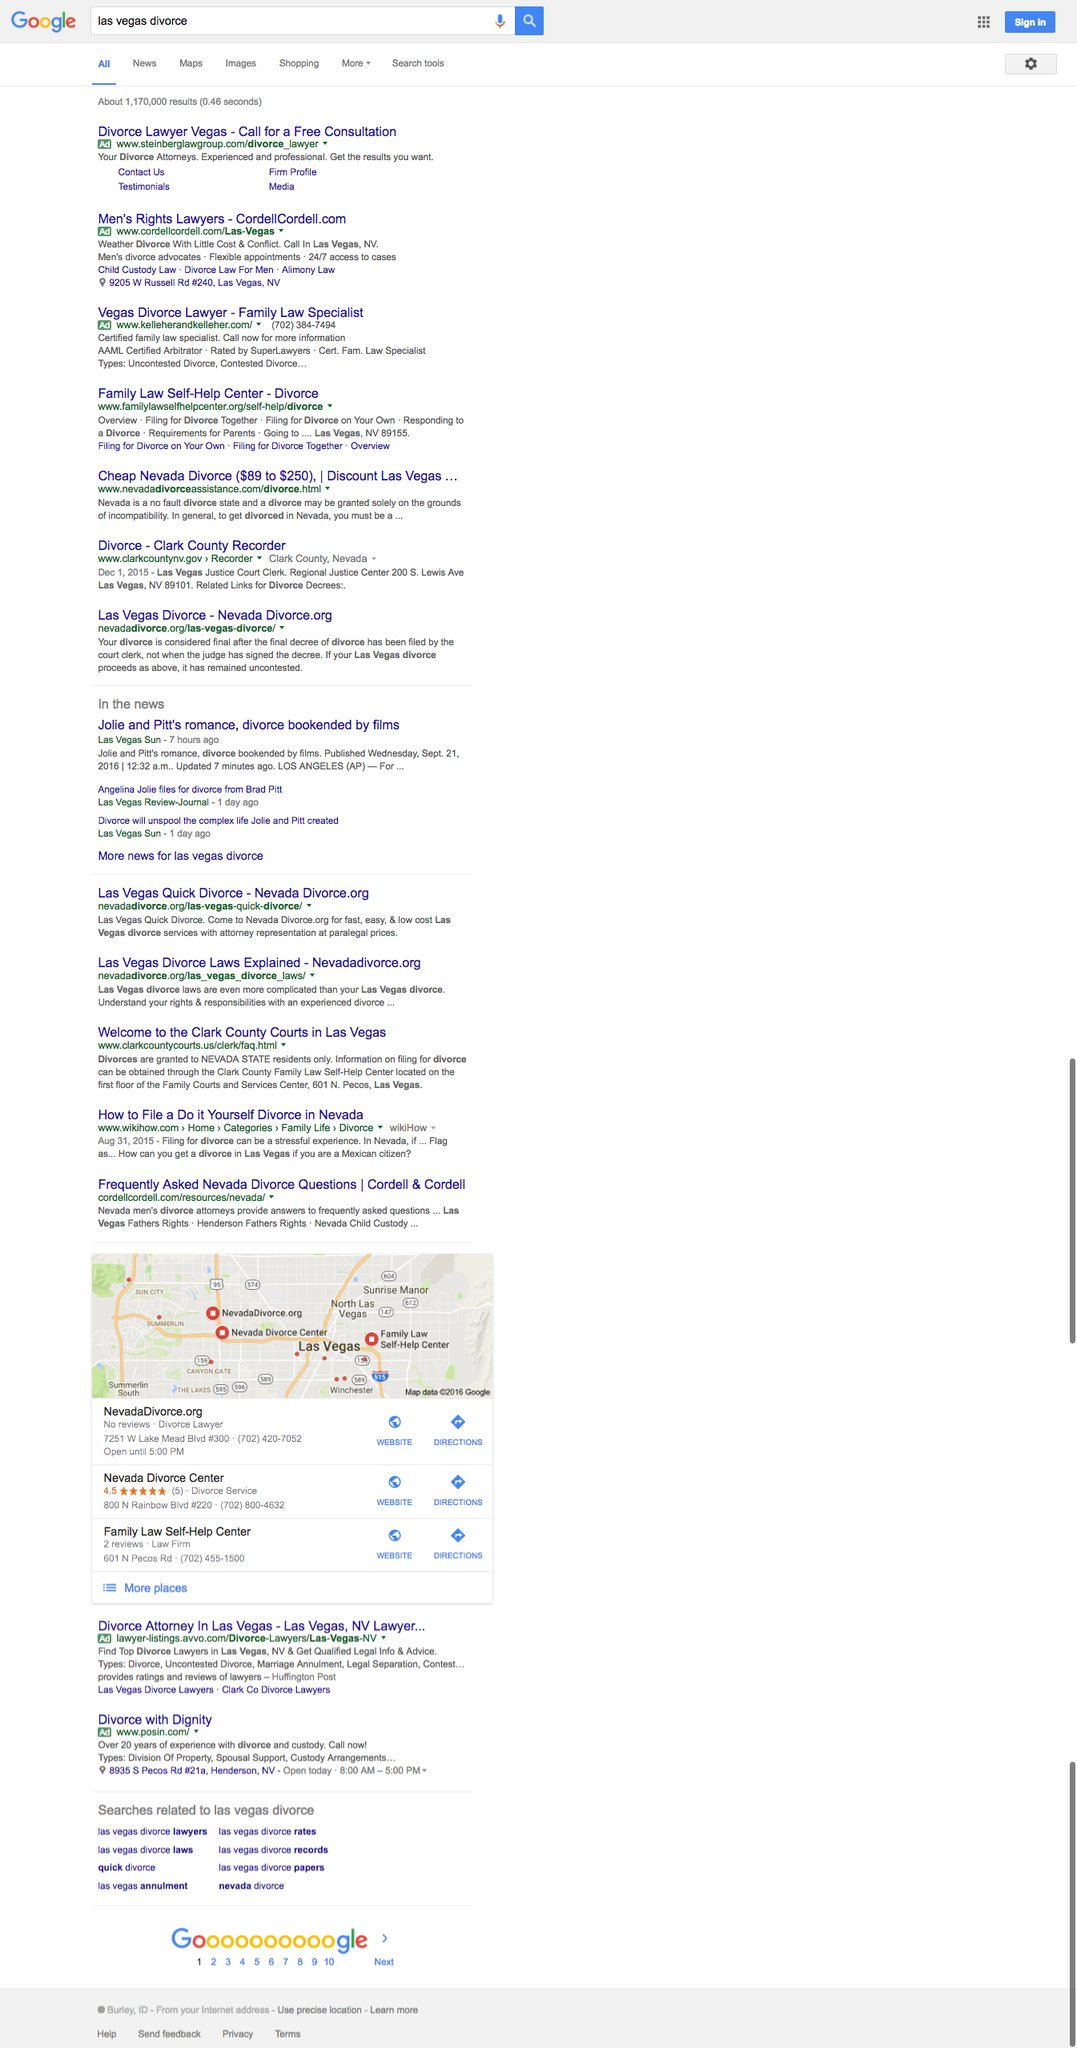 google-local-3-pack-bottom-3